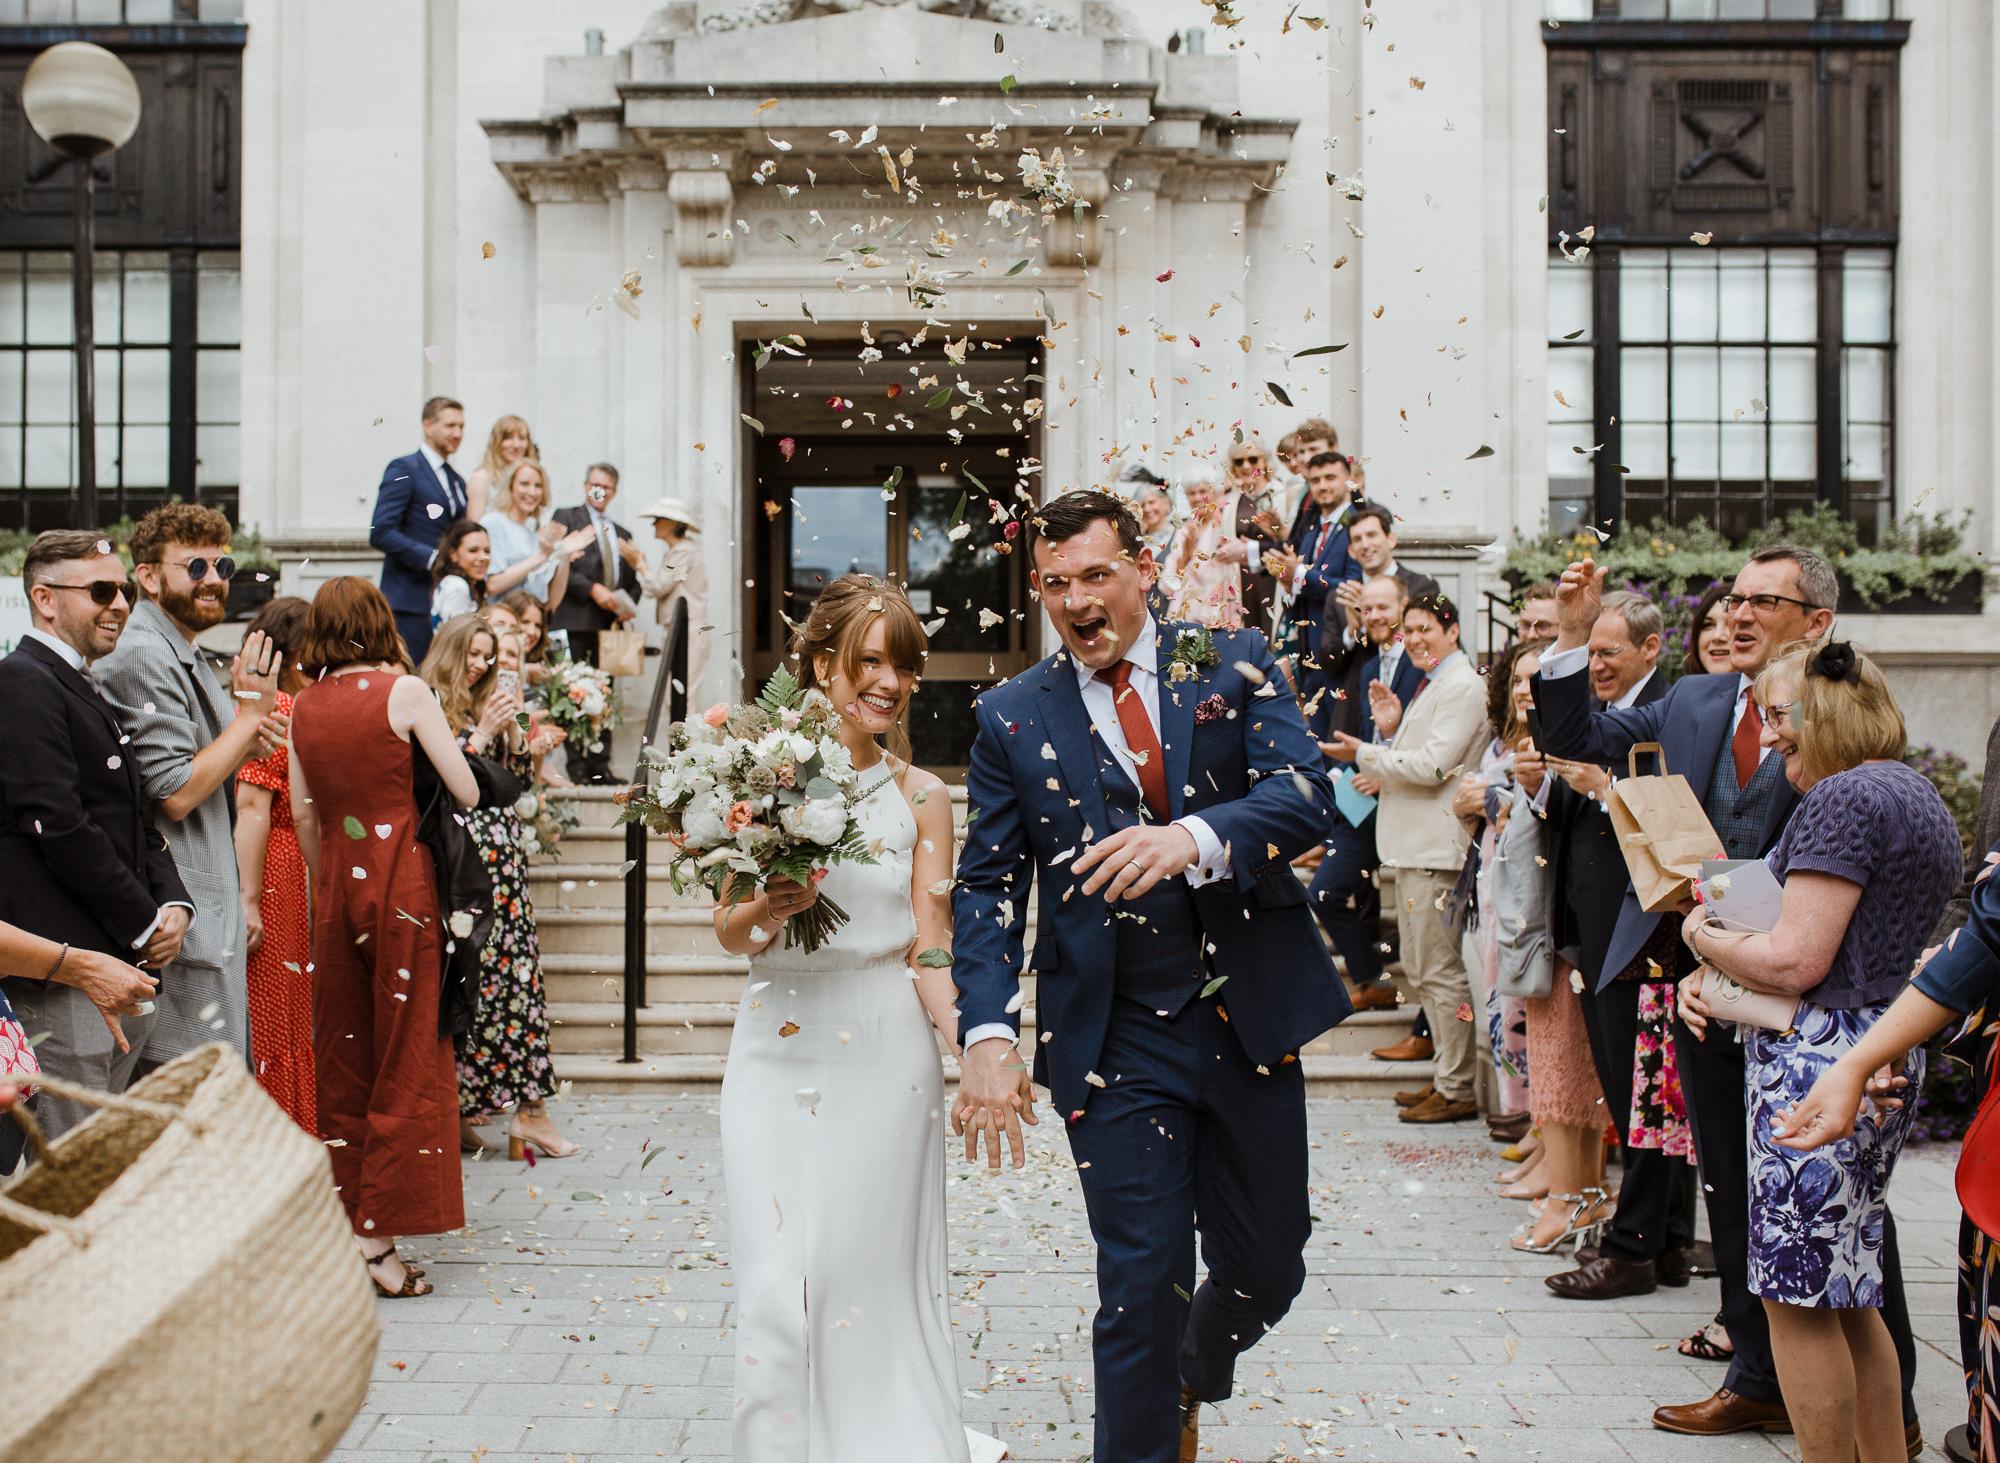 Nicebunch wedding flowers sula london-islington-town-hall-depot-n7 ethical british luxury confetti bouquet stephanie-green-wedding-photography